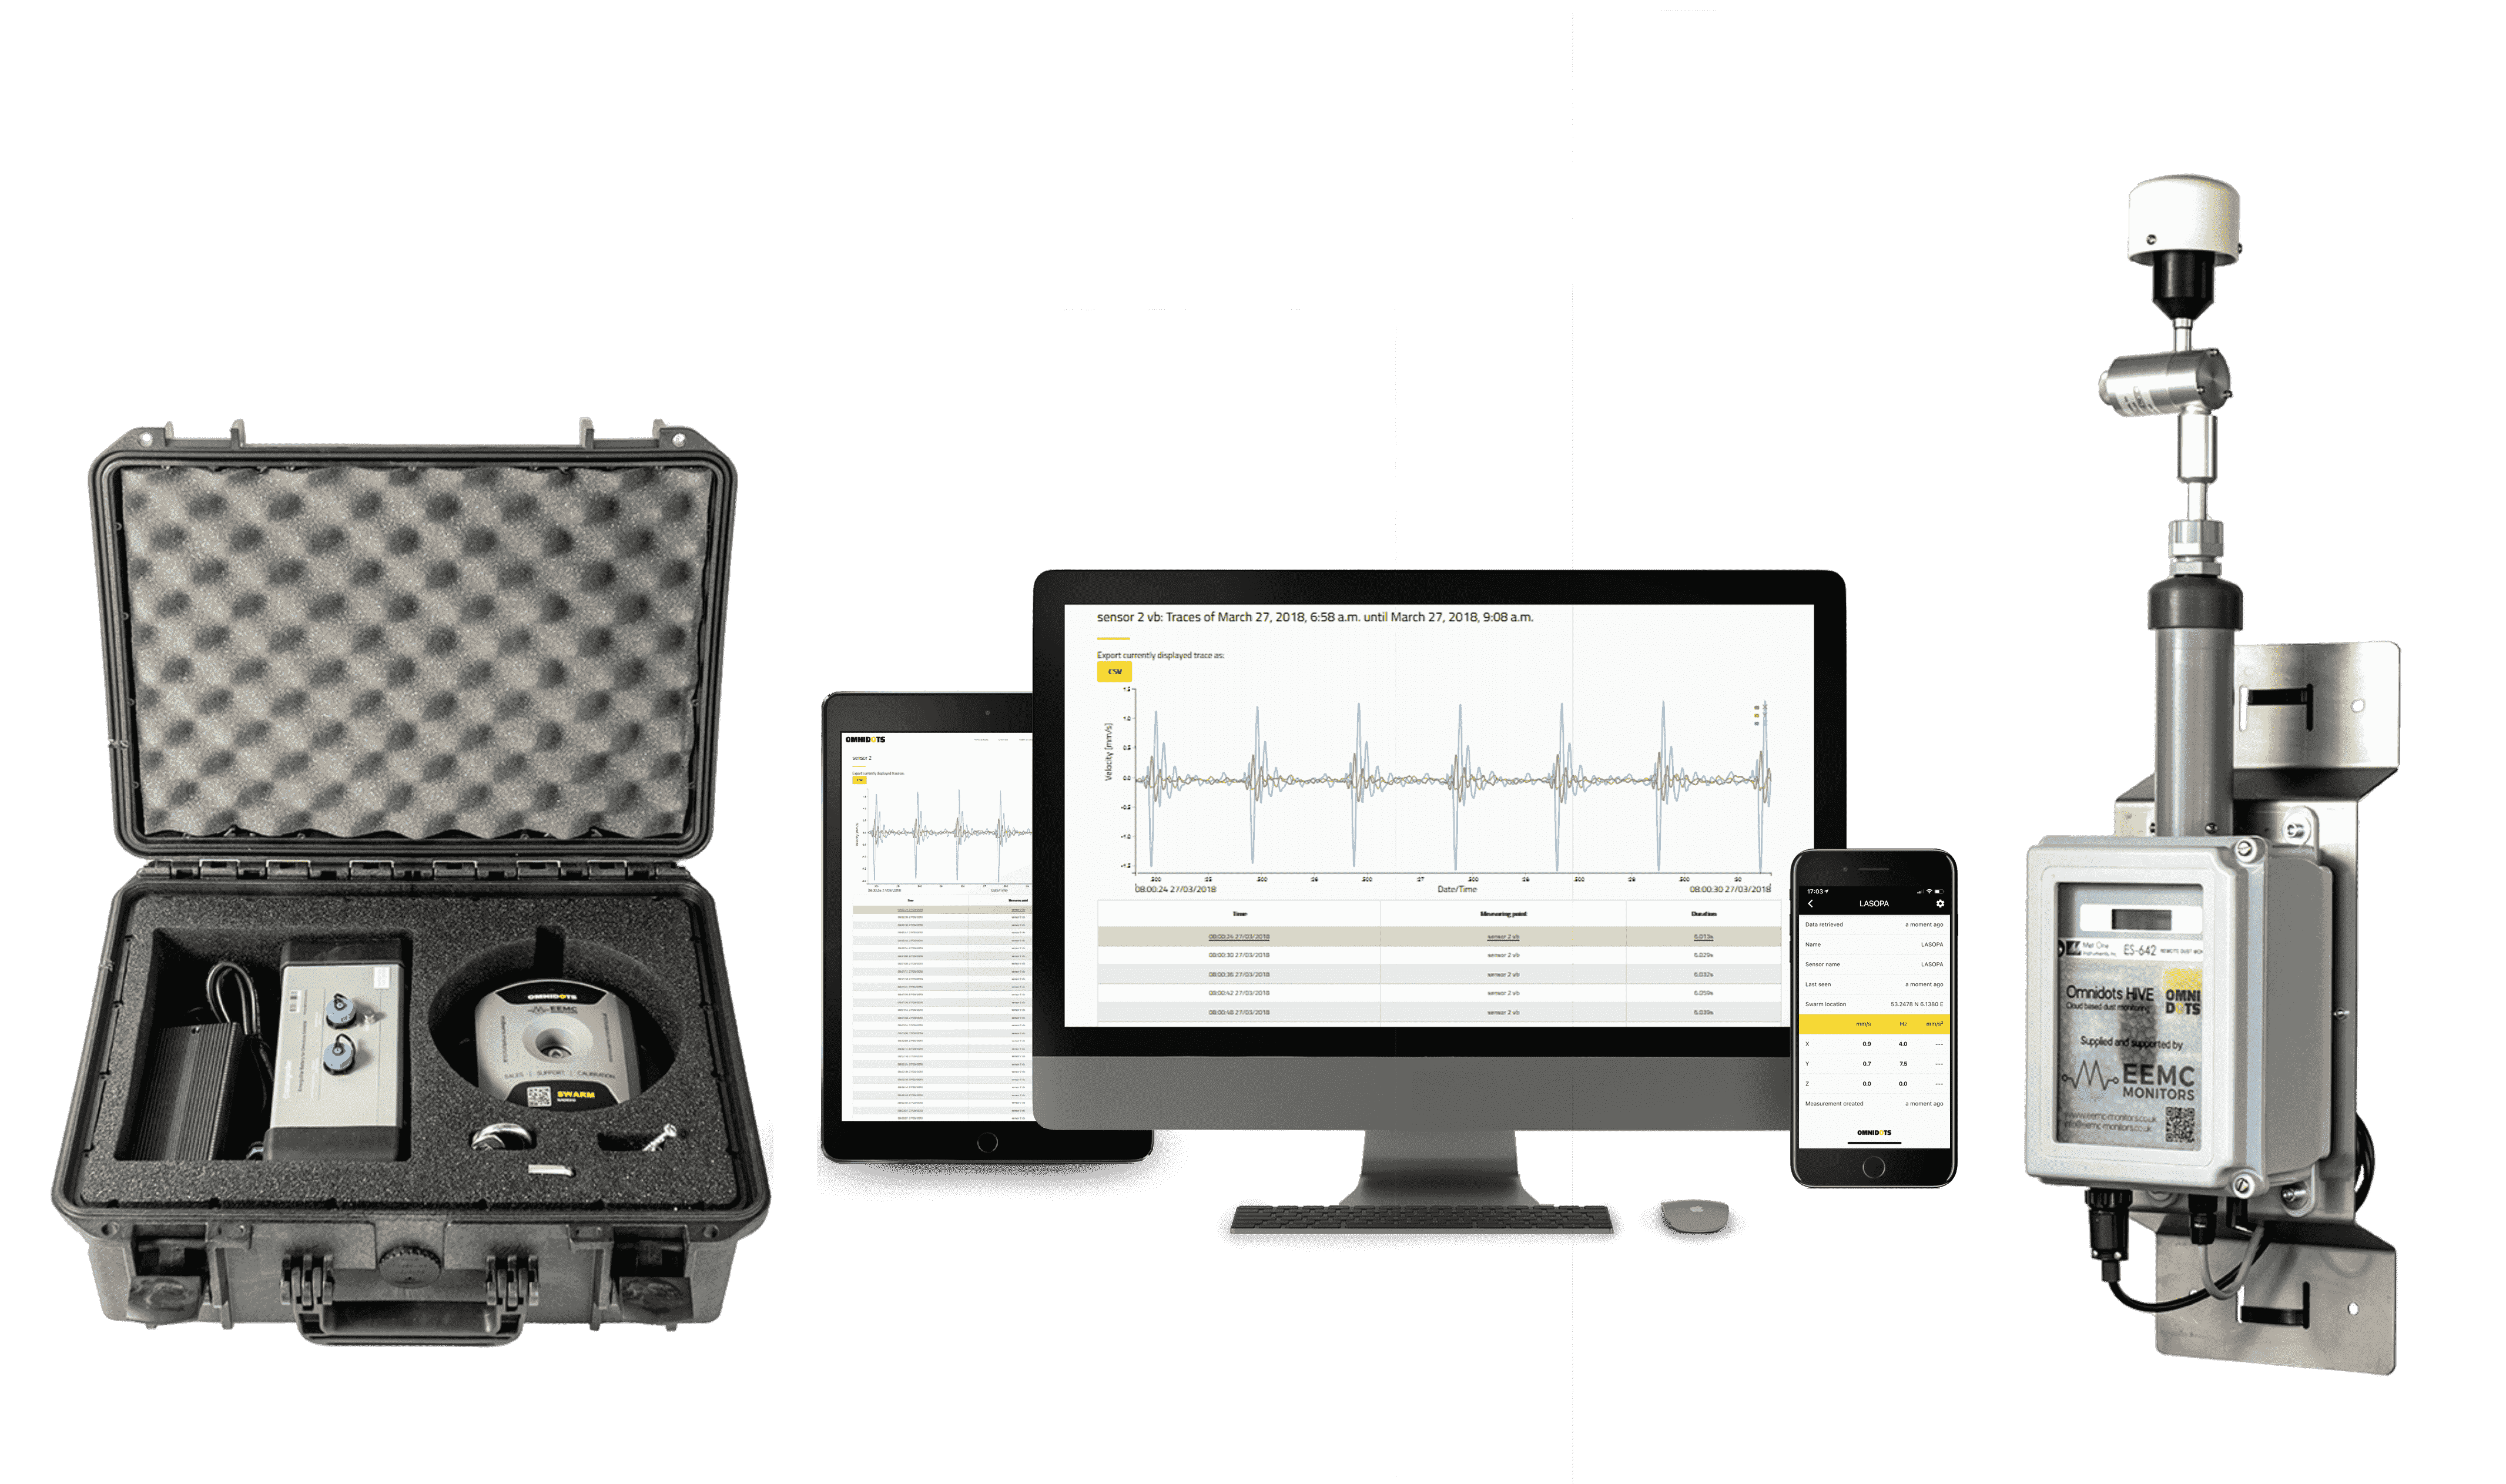 EEMC monitors